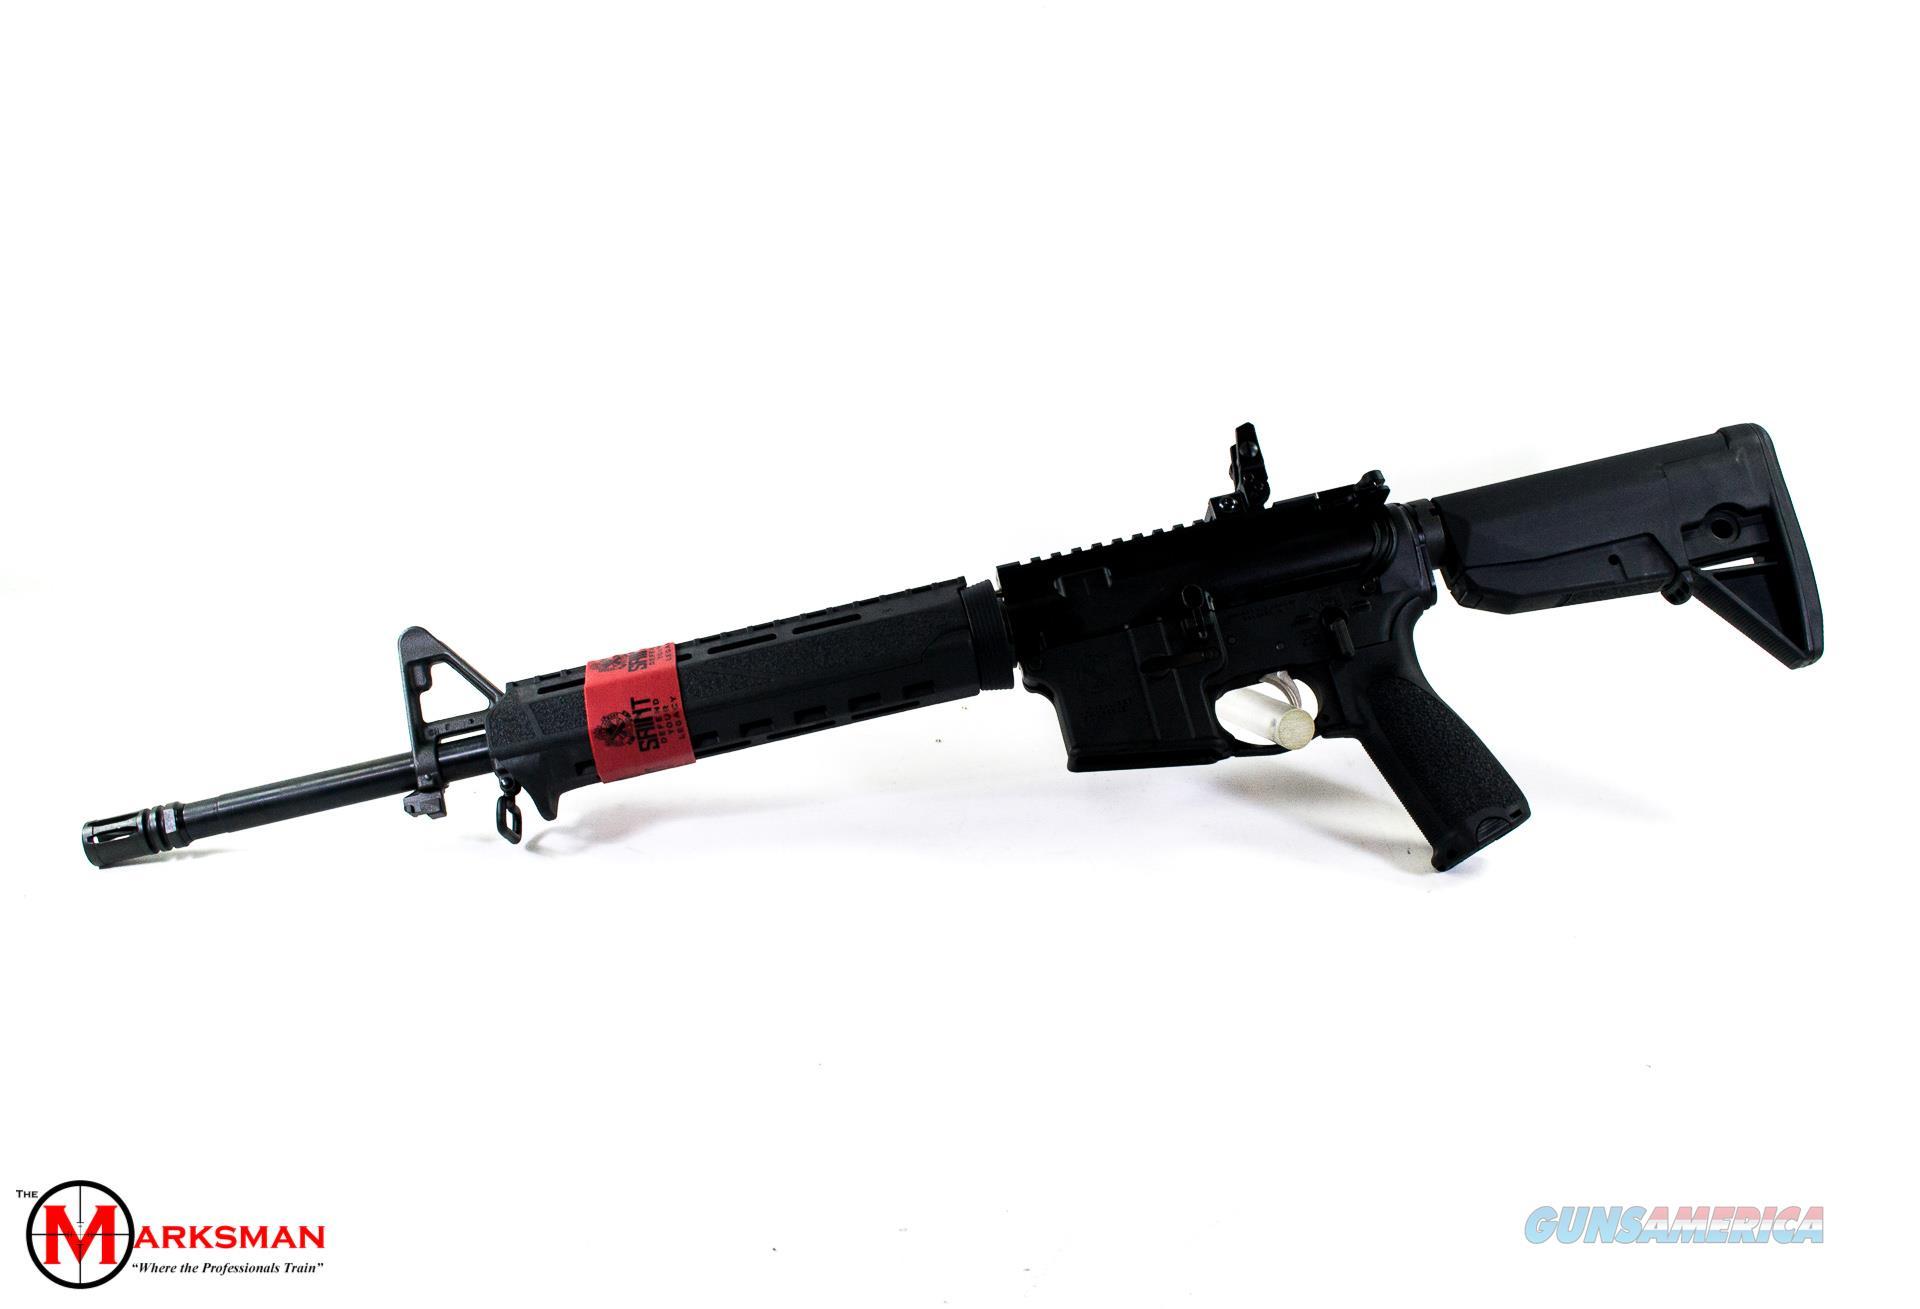 Springfield Armory Saint AR-15, 5.56mm NATO, M-Lok NEW  Guns > Rifles > Springfield Armory Rifles > SAINT